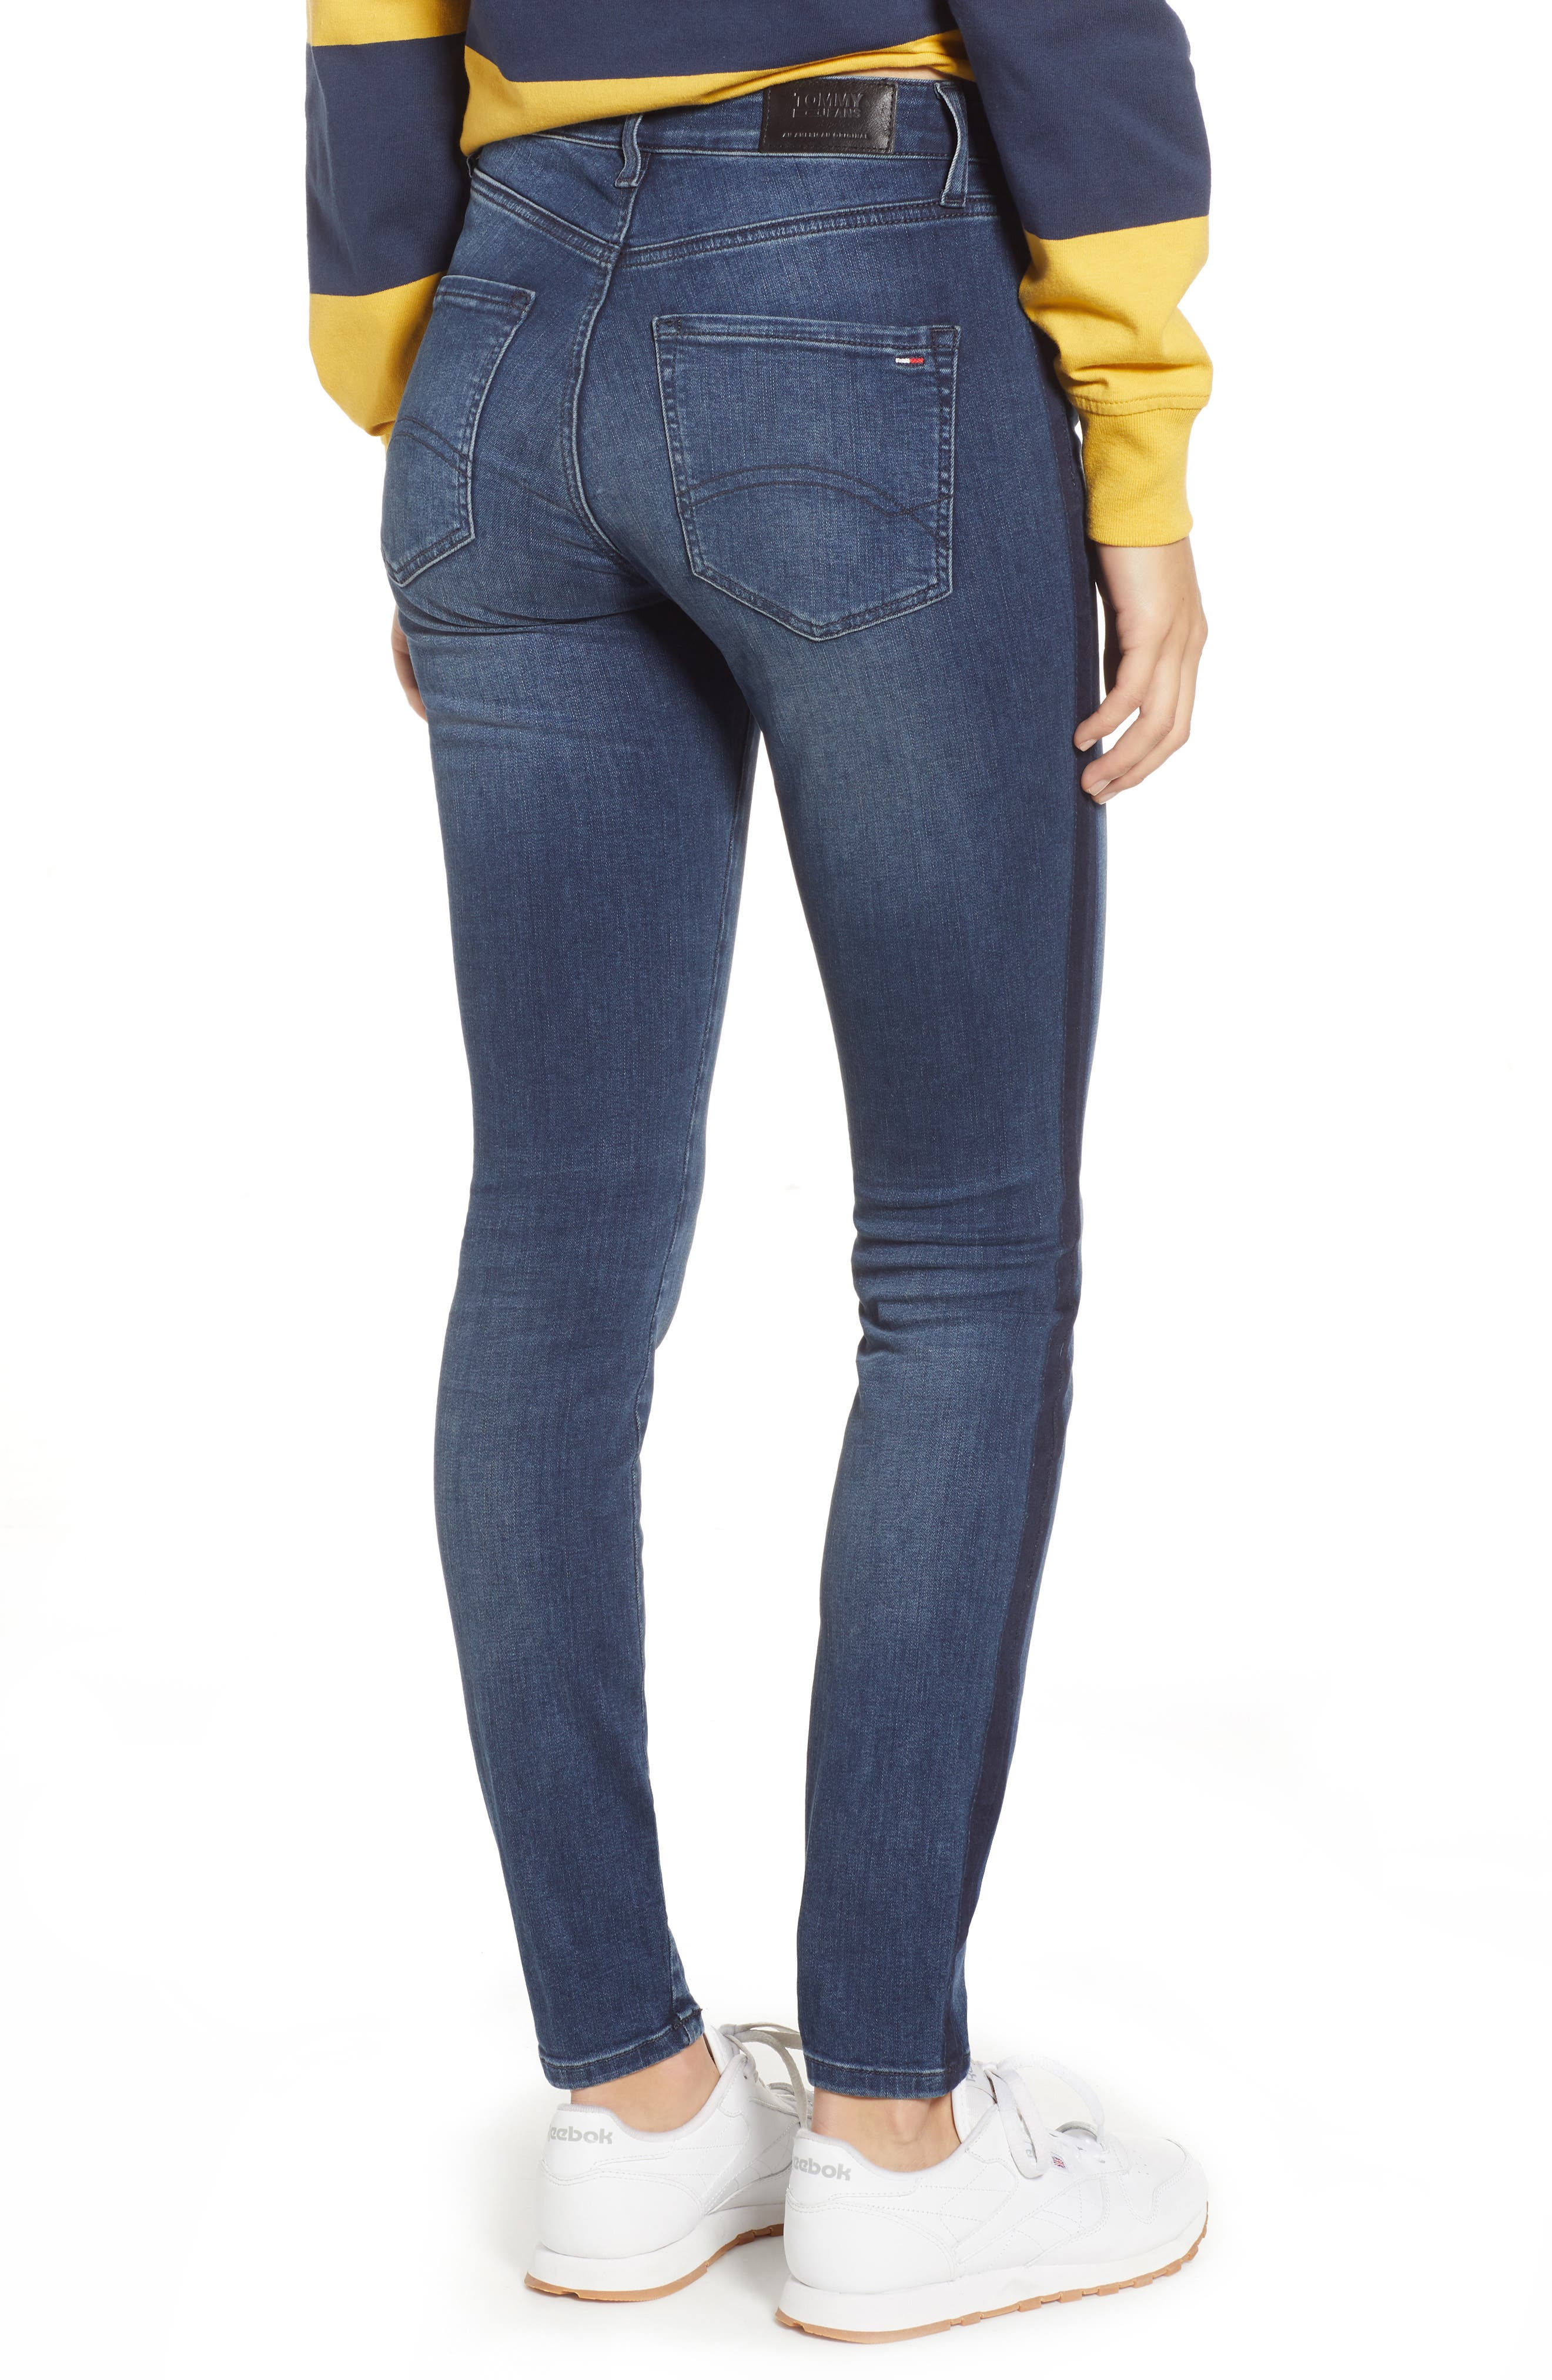 Santana High Waist Skinny Jeans,                             Alternate thumbnail 2, color,                             NEDDLE DARK BLUE STRETCH